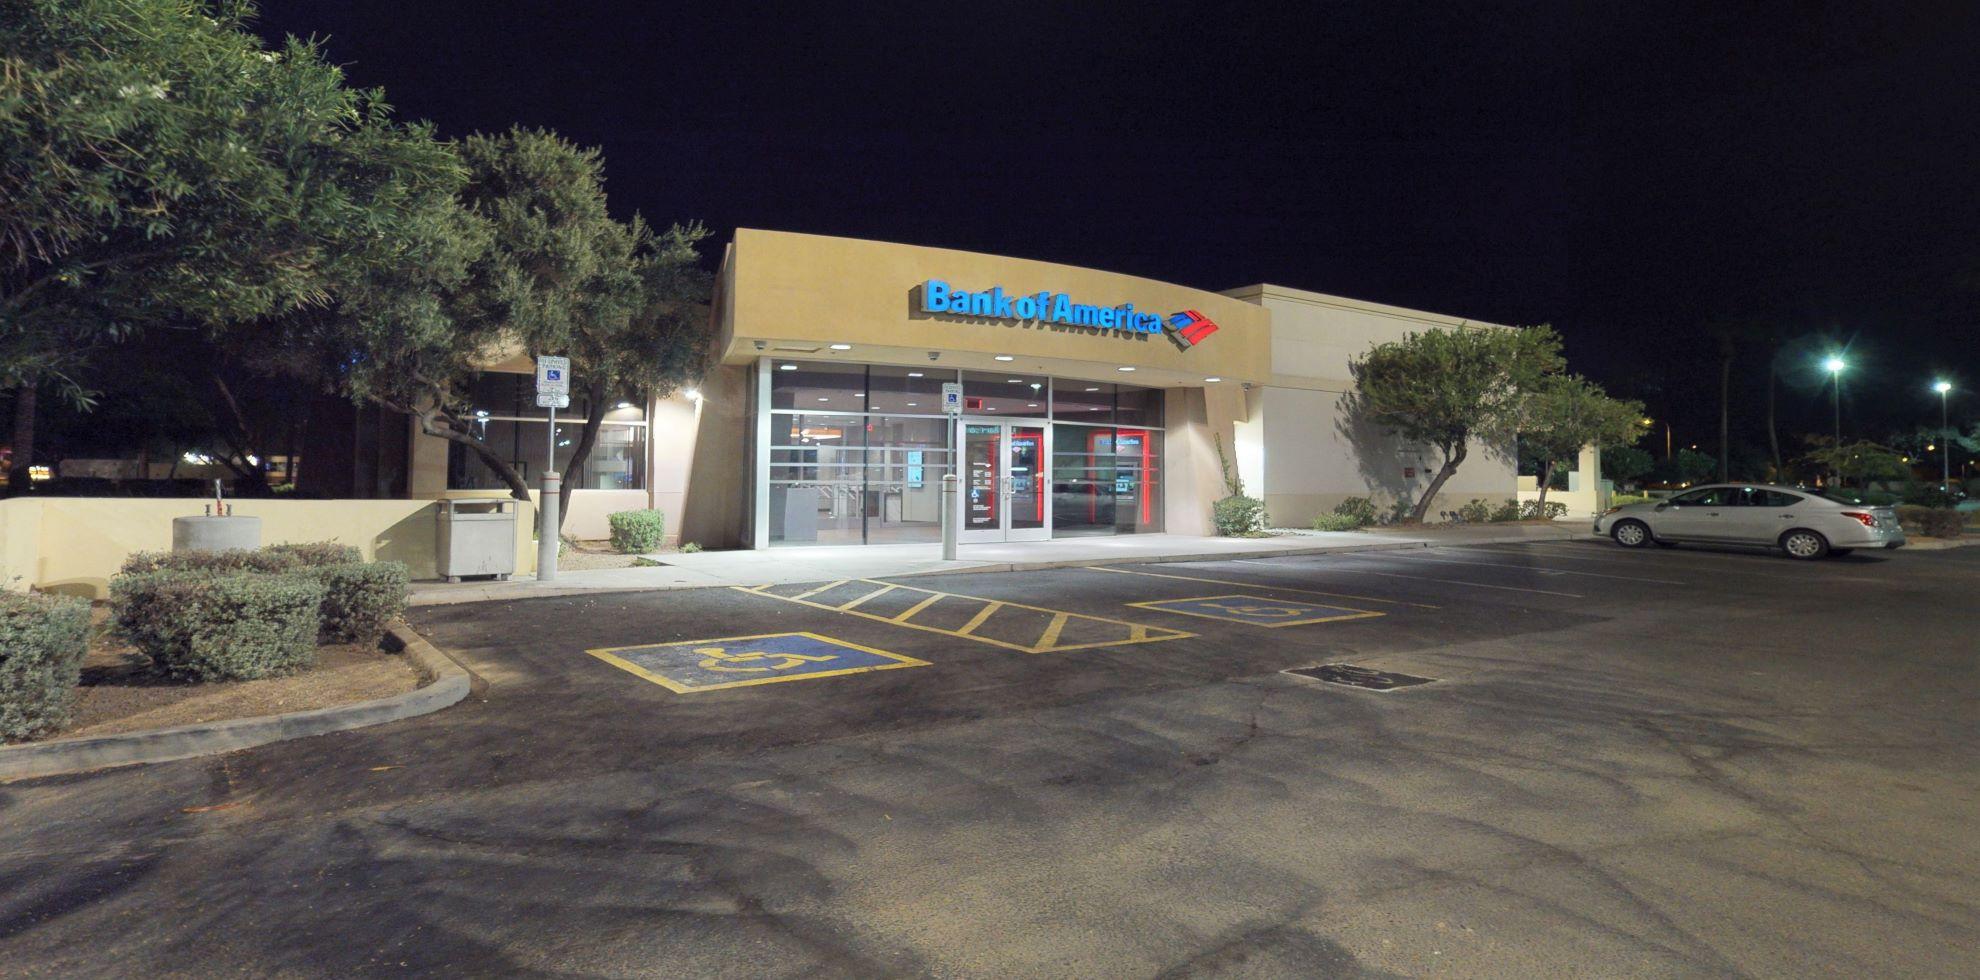 Bank of America financial center with drive-thru ATM   3075 S Alma School Rd, Chandler, AZ 85248